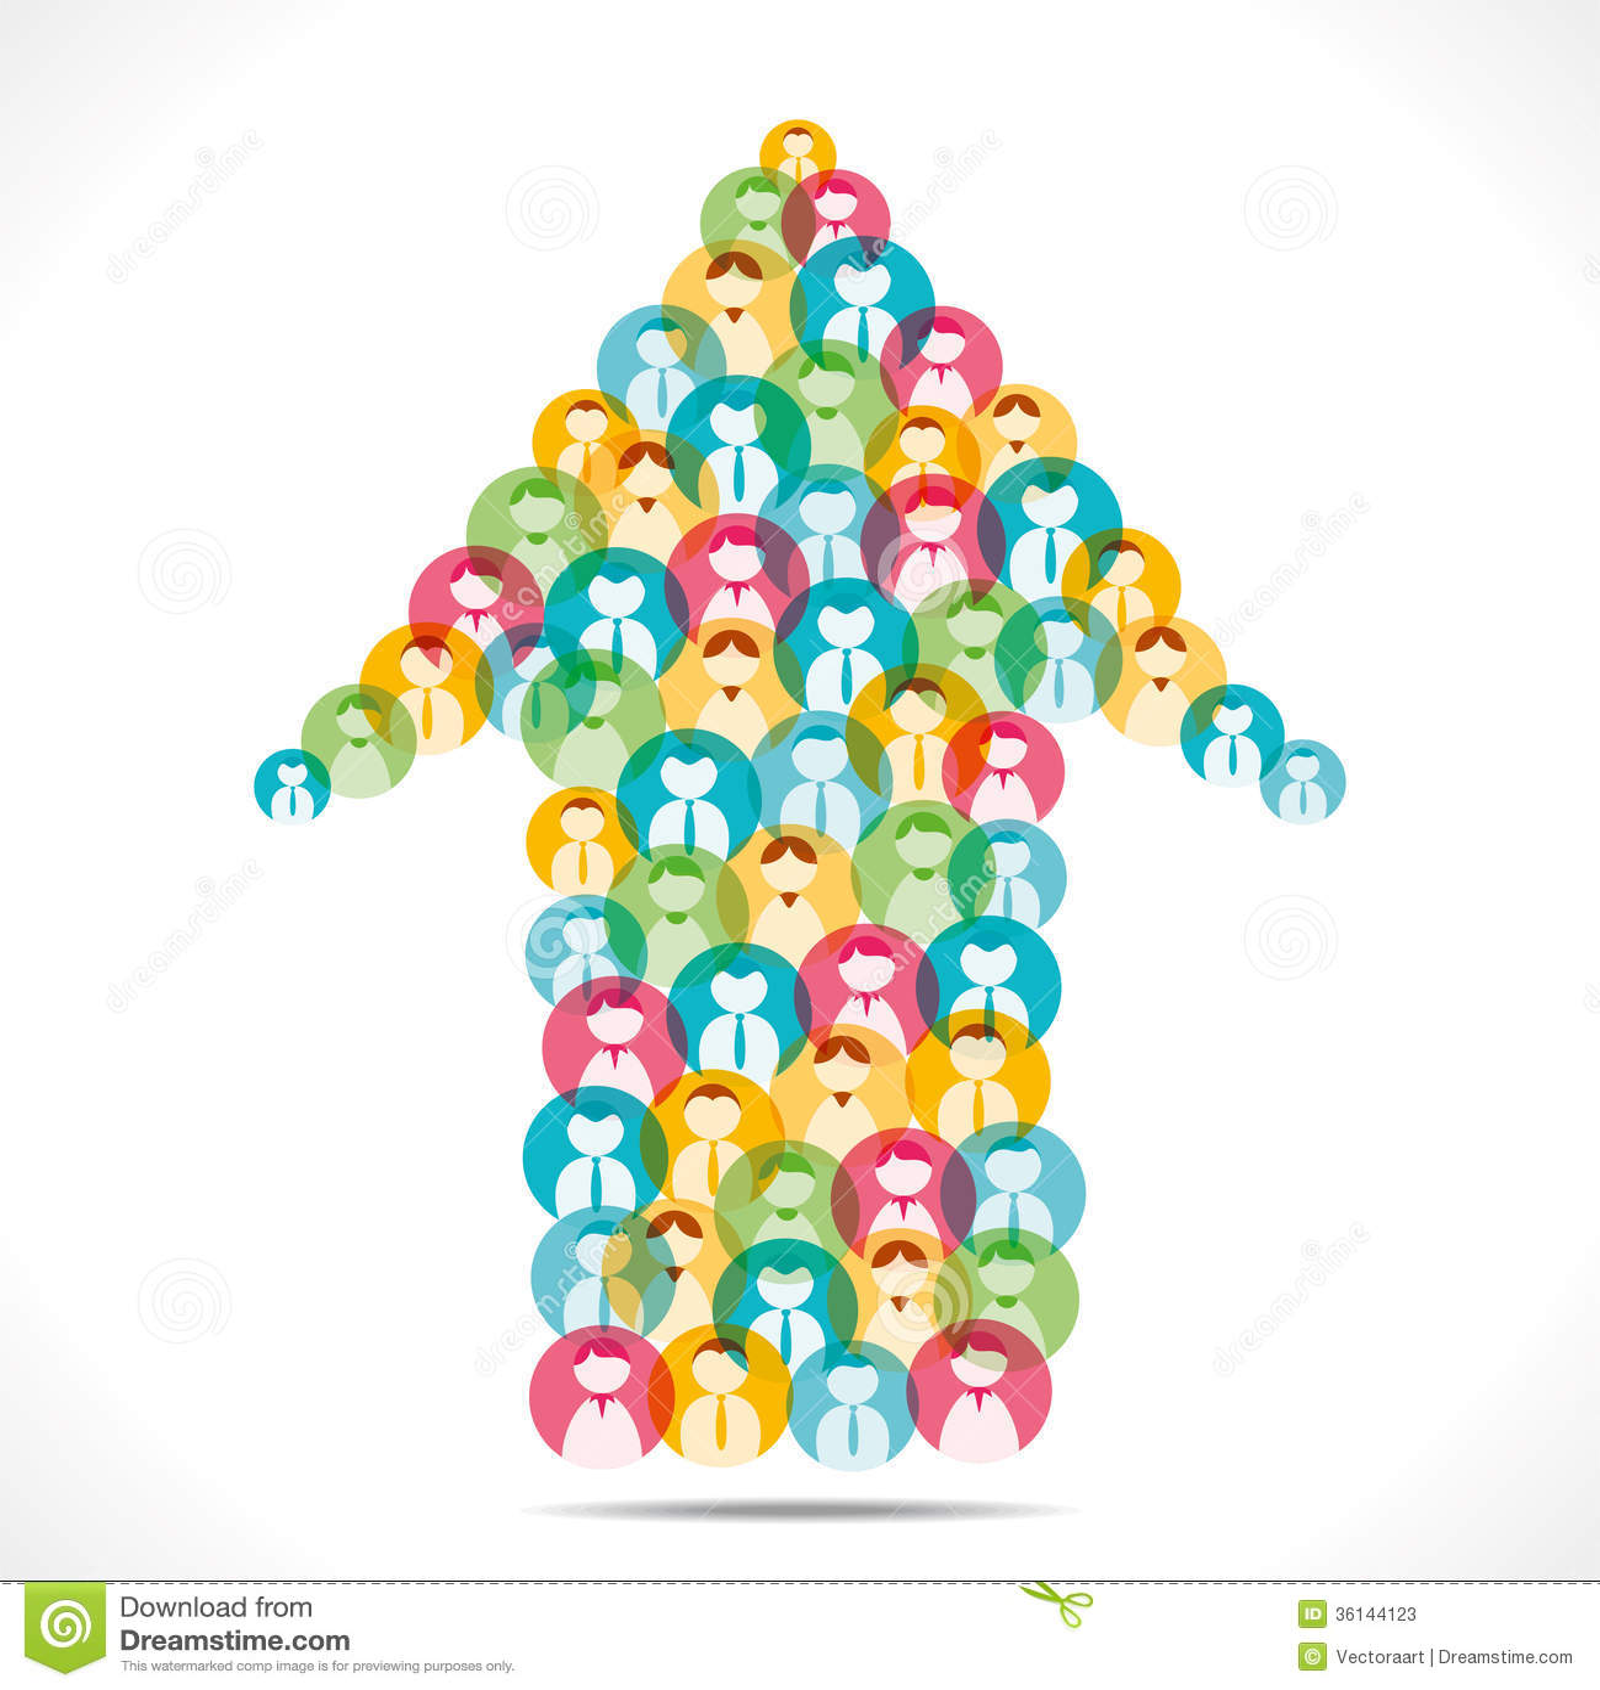 colorful people icon design arrow stock photos image